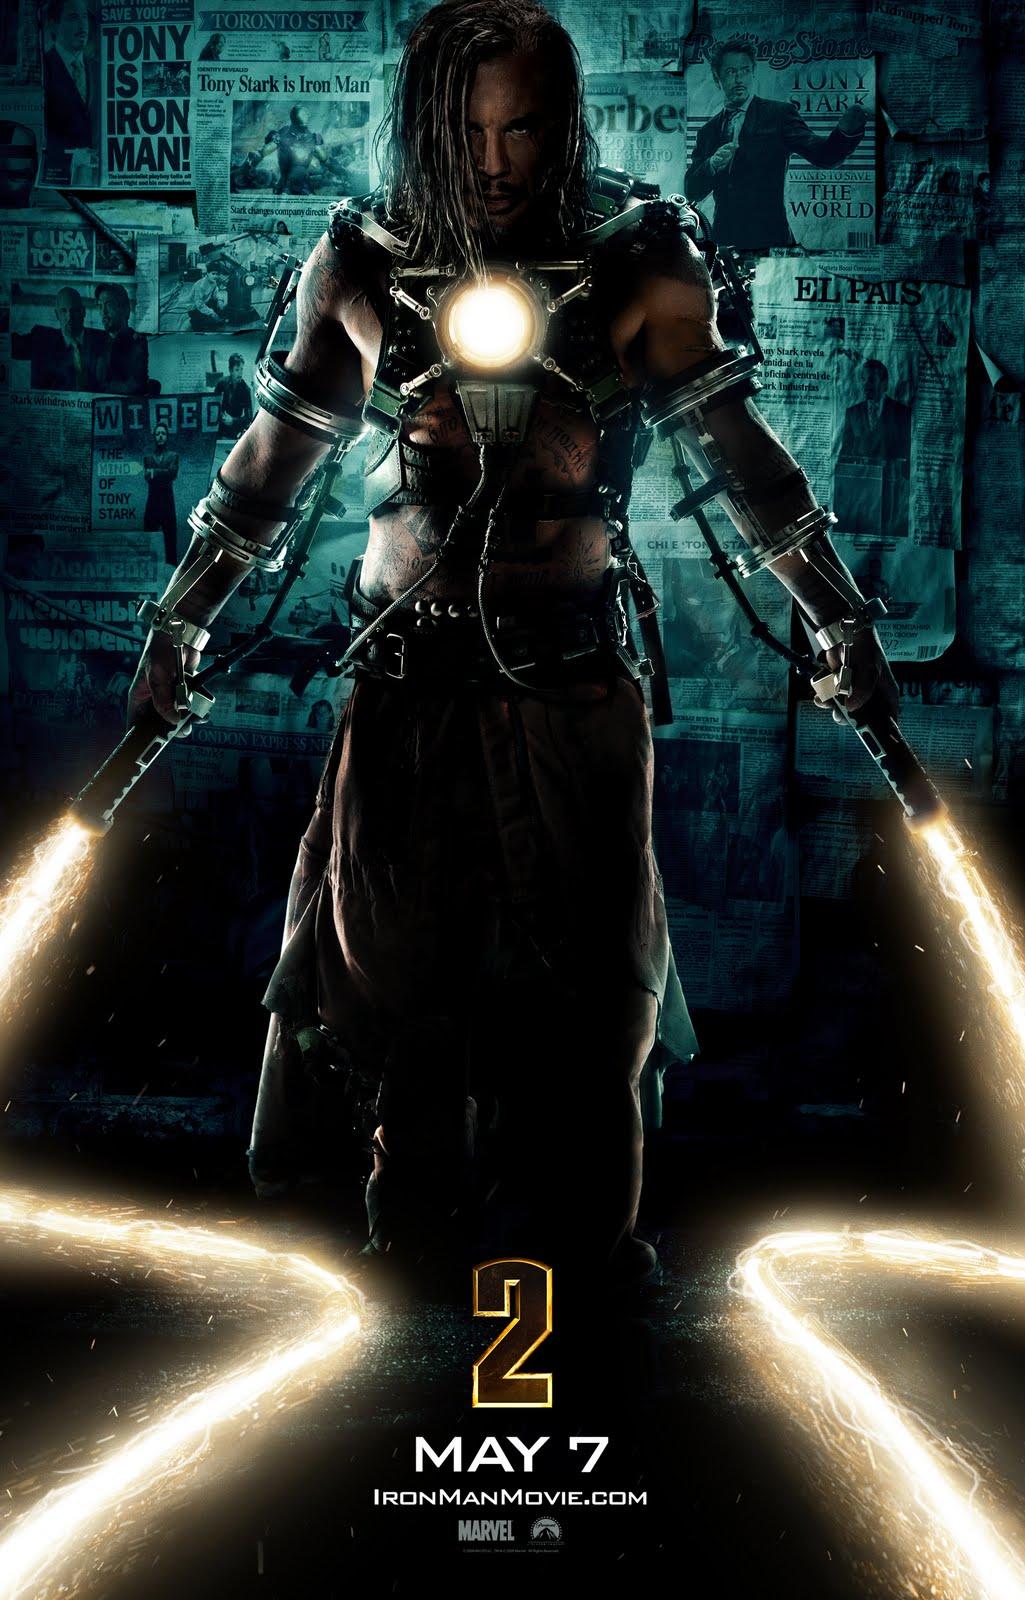 http://1.bp.blogspot.com/_XI3EuhoLnBE/S-YaUn9-WZI/AAAAAAAAAwc/ICL9h-CmMHs/s1600/iron-man-2-movie-poster.jpg